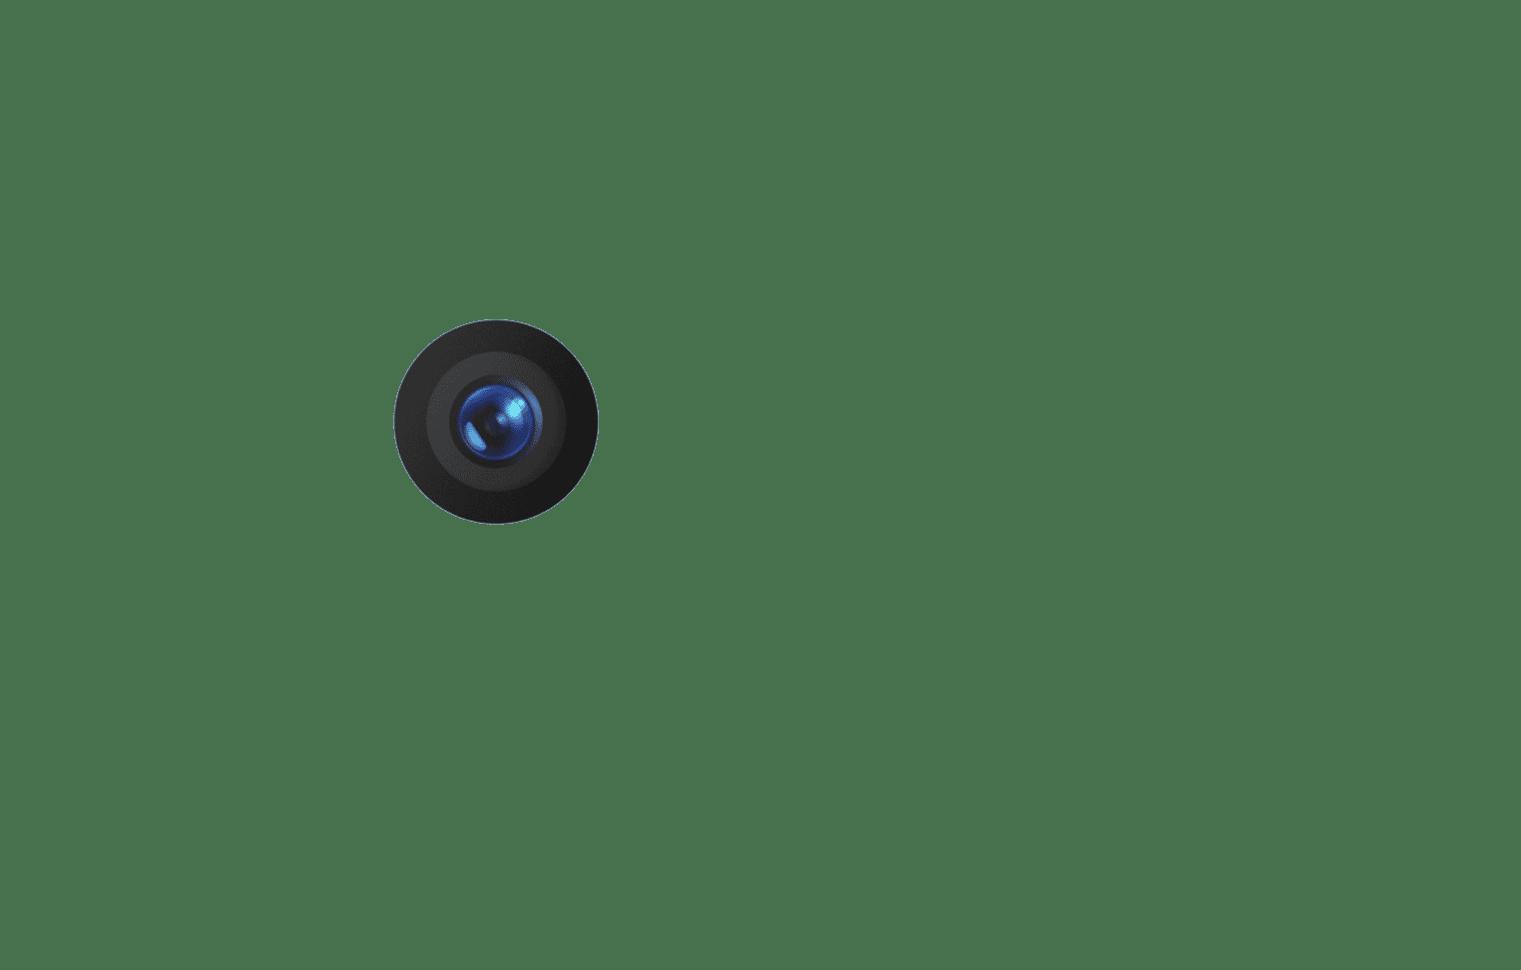 camera_lens_1920-c980b6